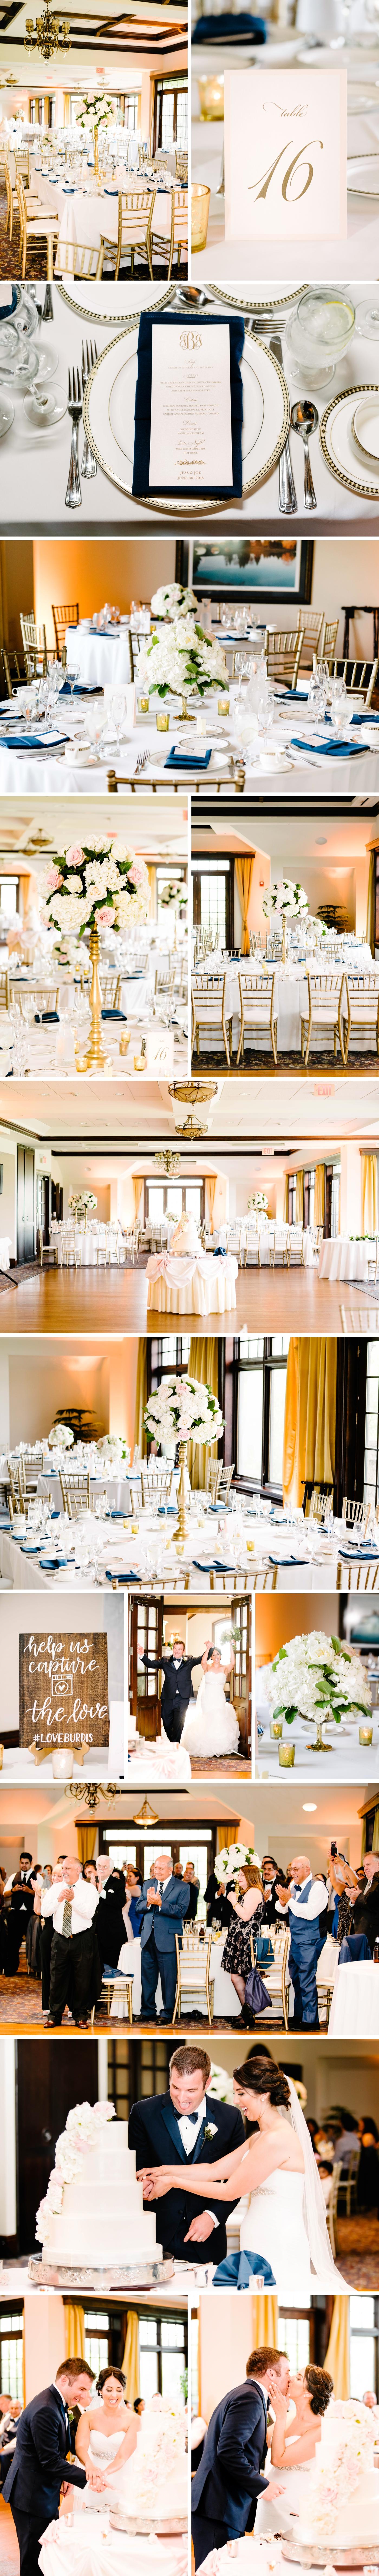 chicago-fine-art-wedding-photography-burdi8